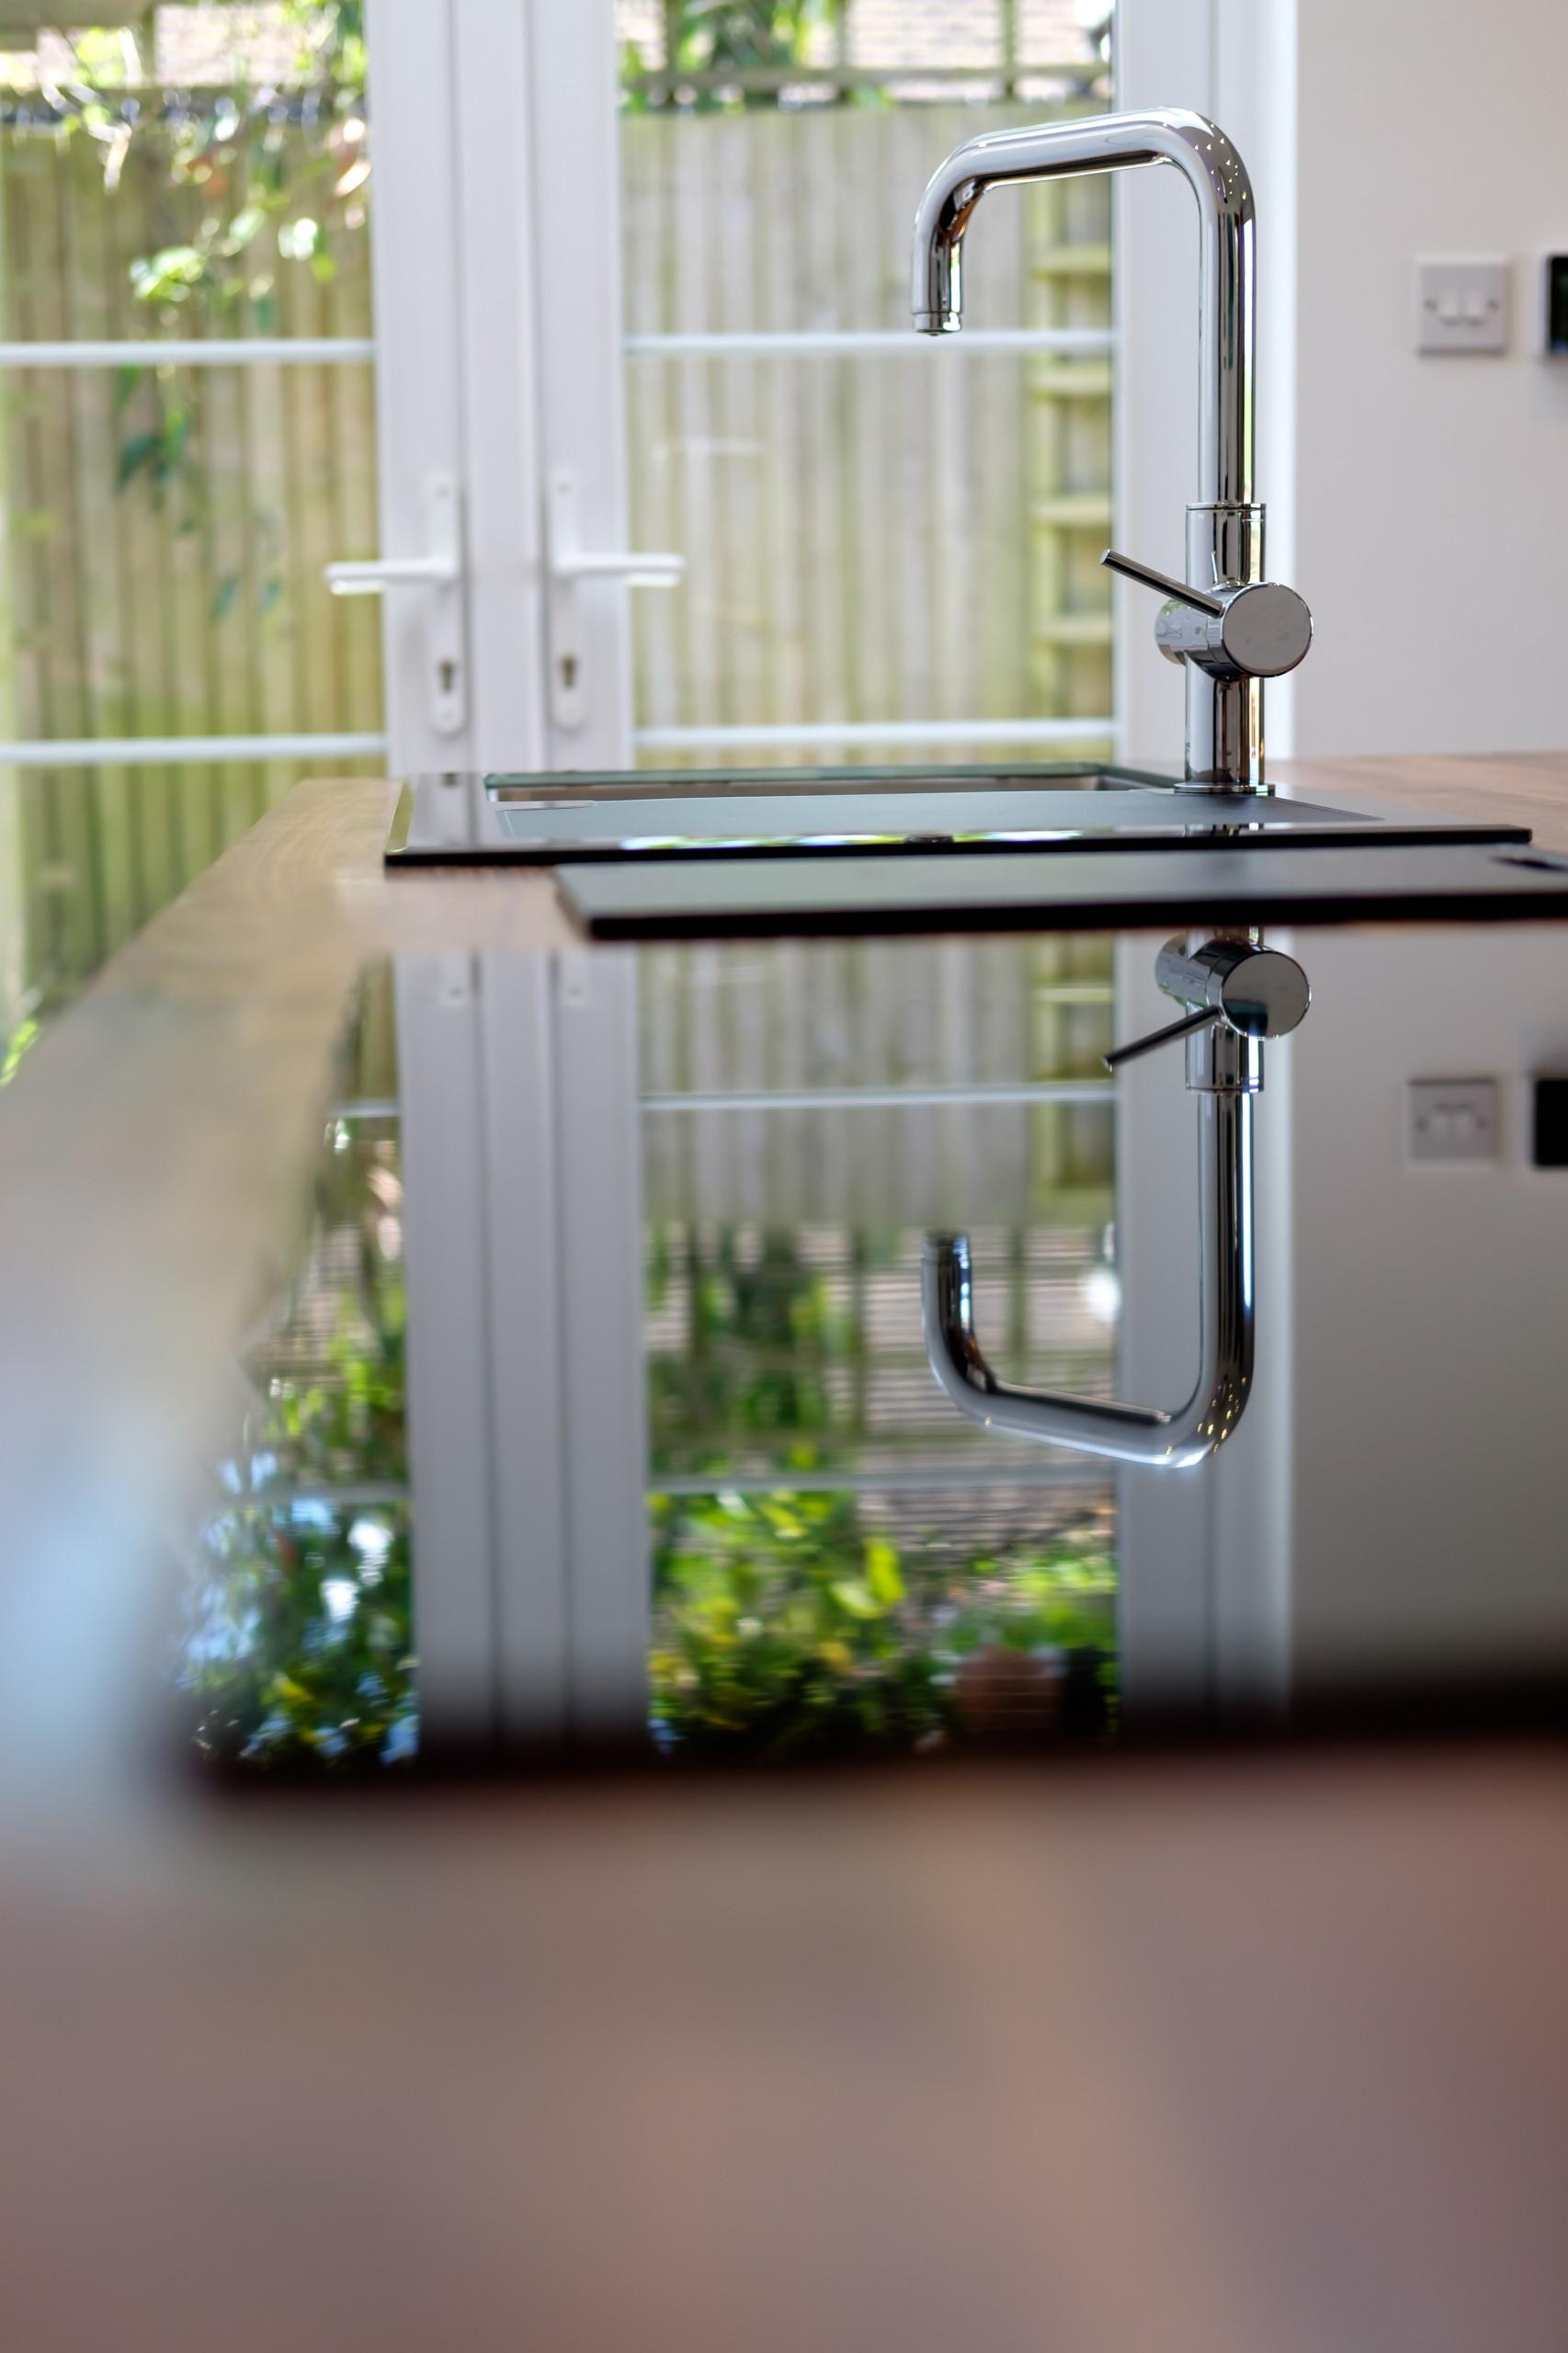 Sink/Tap